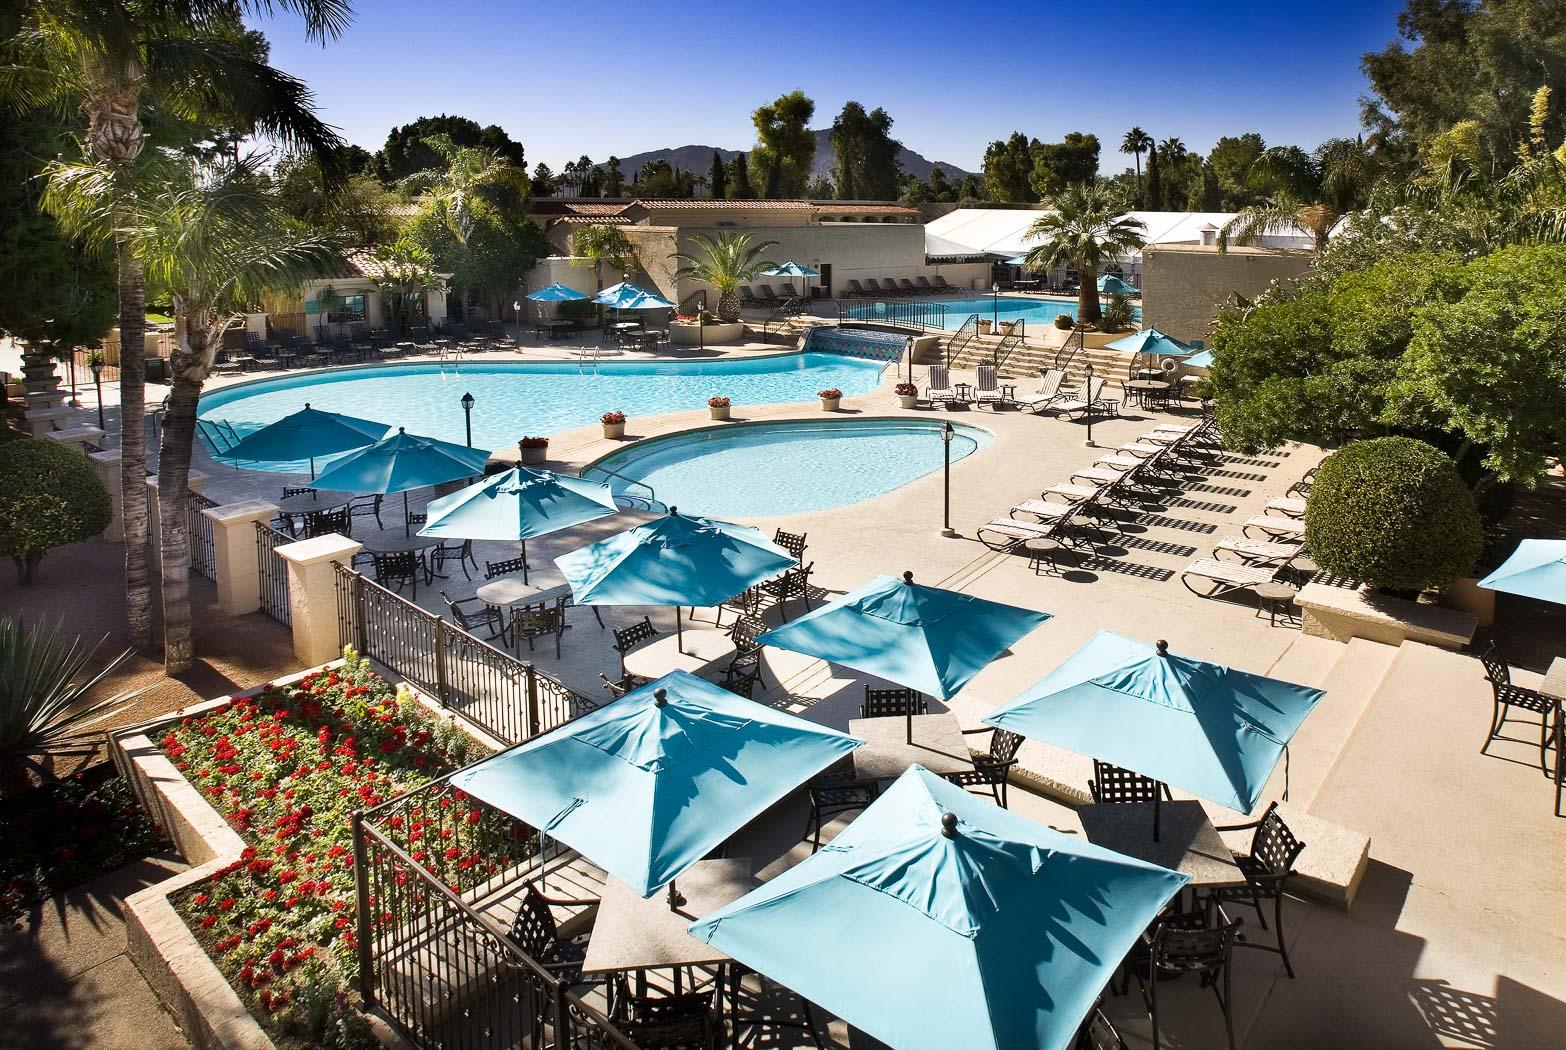 The Scottsdale Plaza Resort - Paradise Valley, AZ 85253 - (480)948-5000 | ShowMeLocal.com